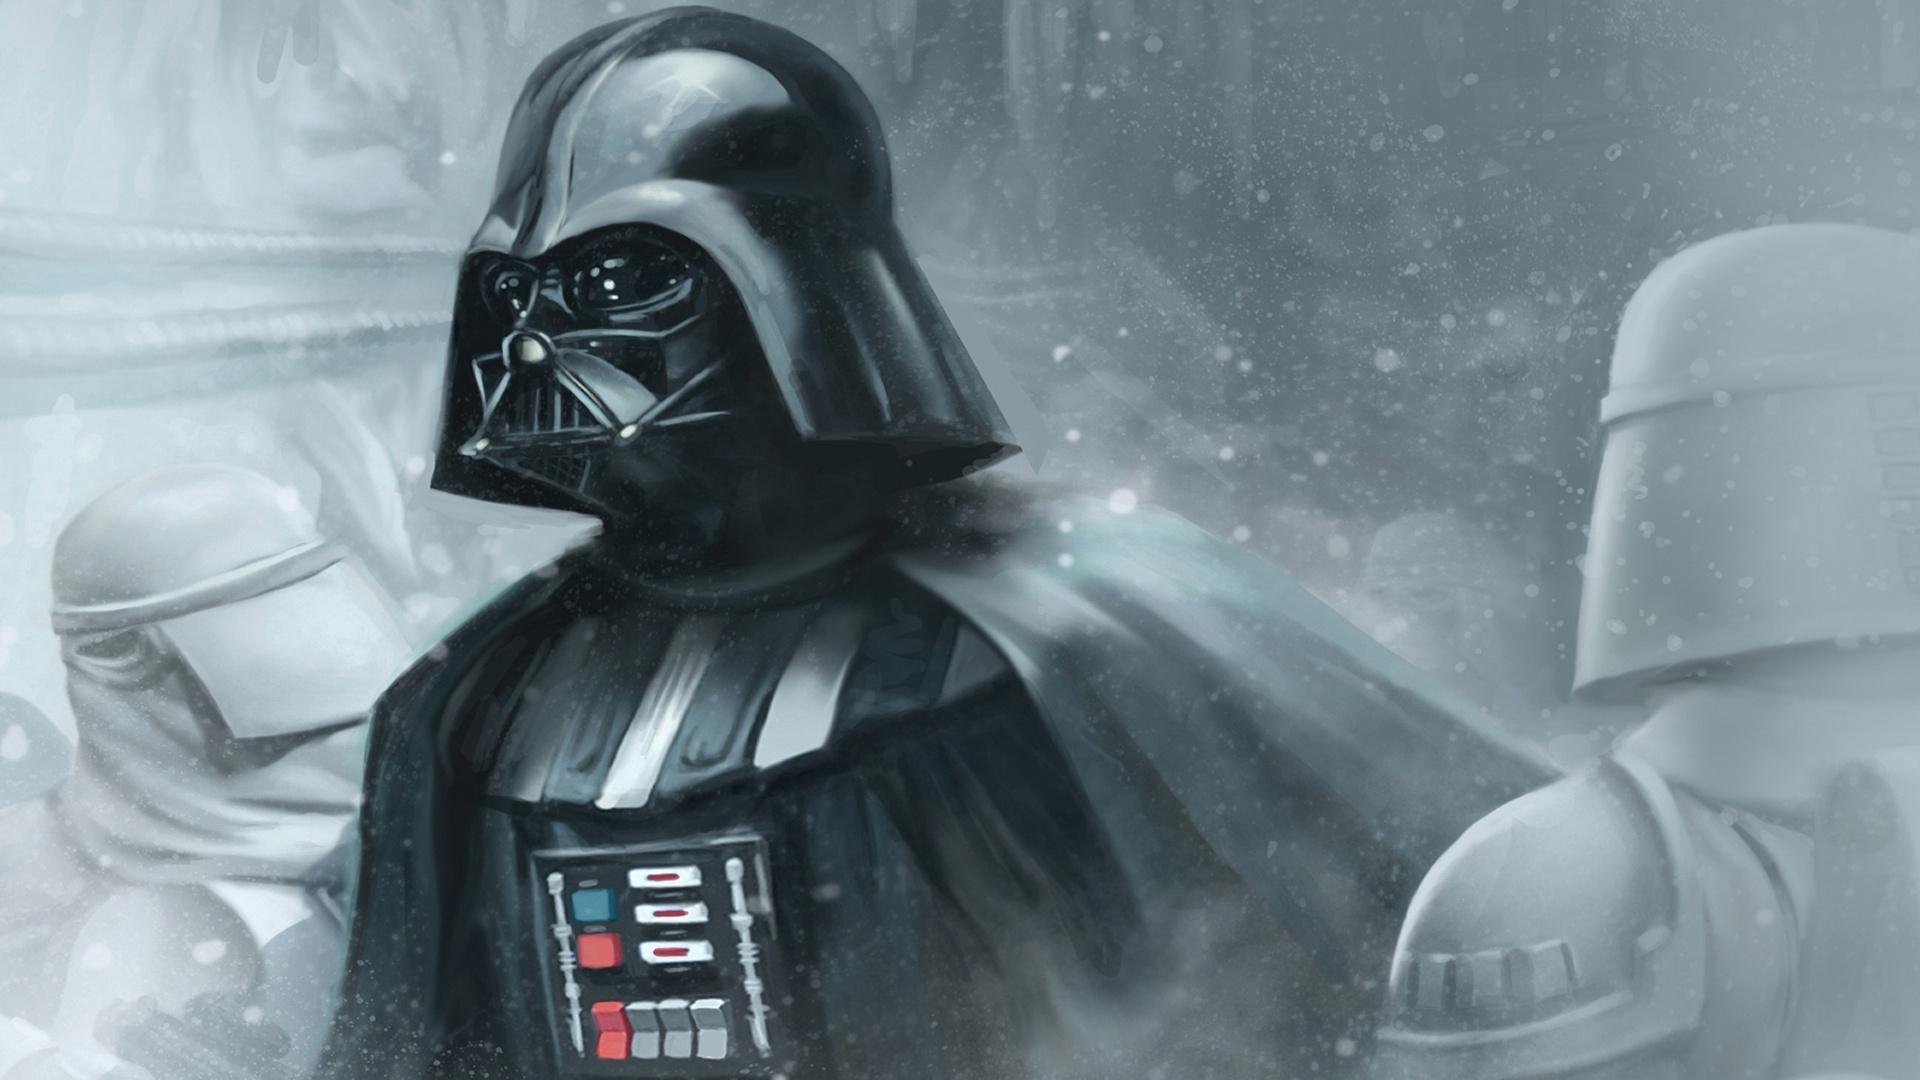 Star Wars Darth Vader Wallpaper Darth Vader Wallpaper 4k 71908 Hd Wallpaper Backgrounds Download